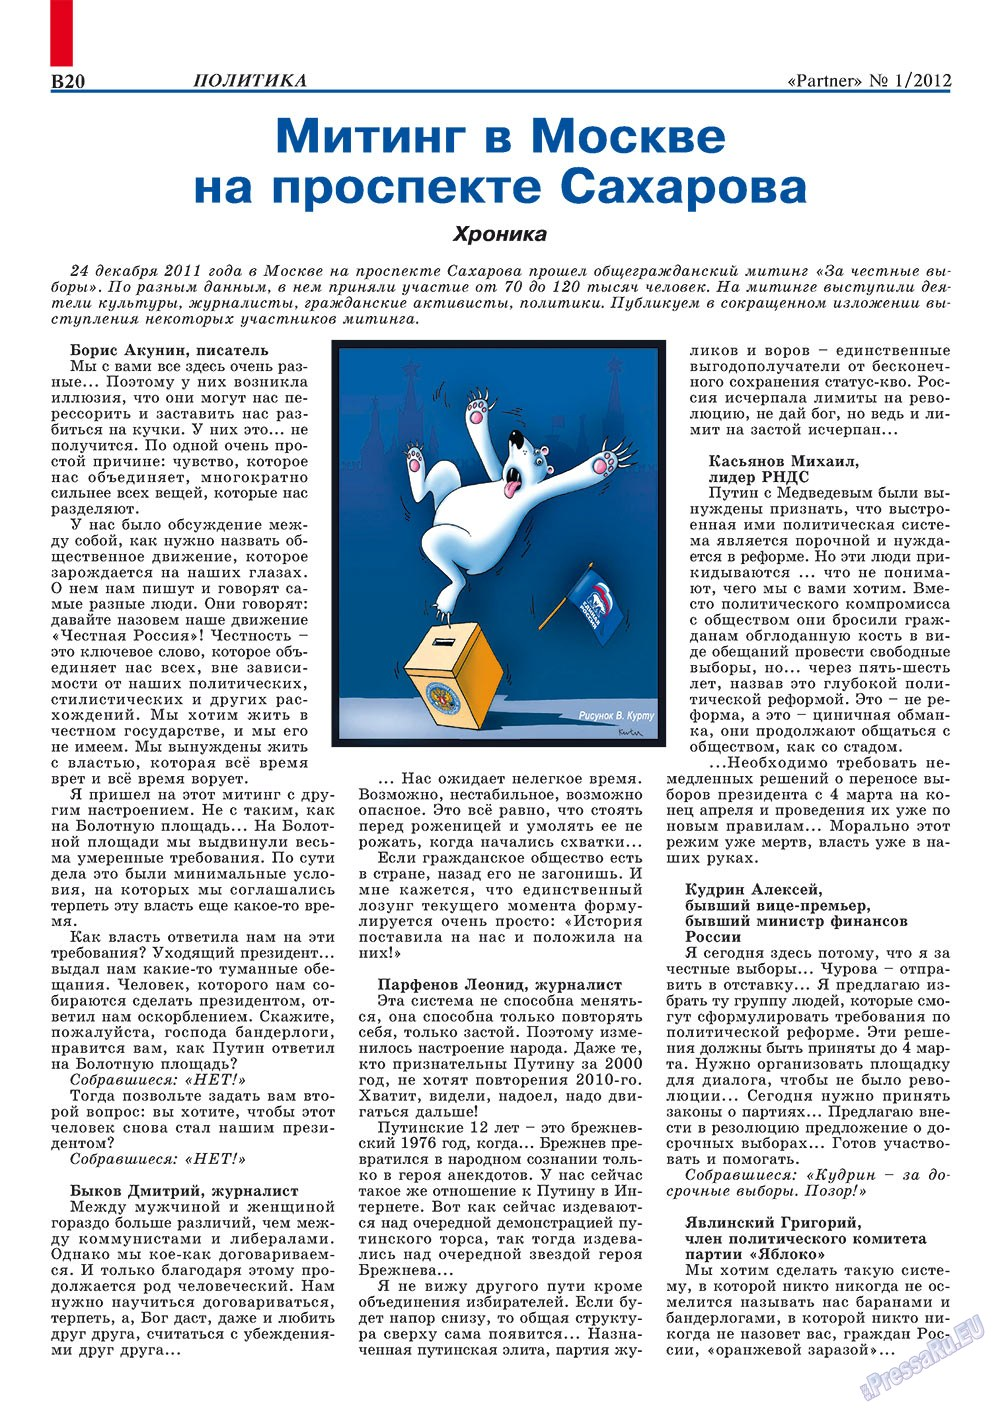 Партнер-север (журнал). 2012 год, номер 1, стр. 30